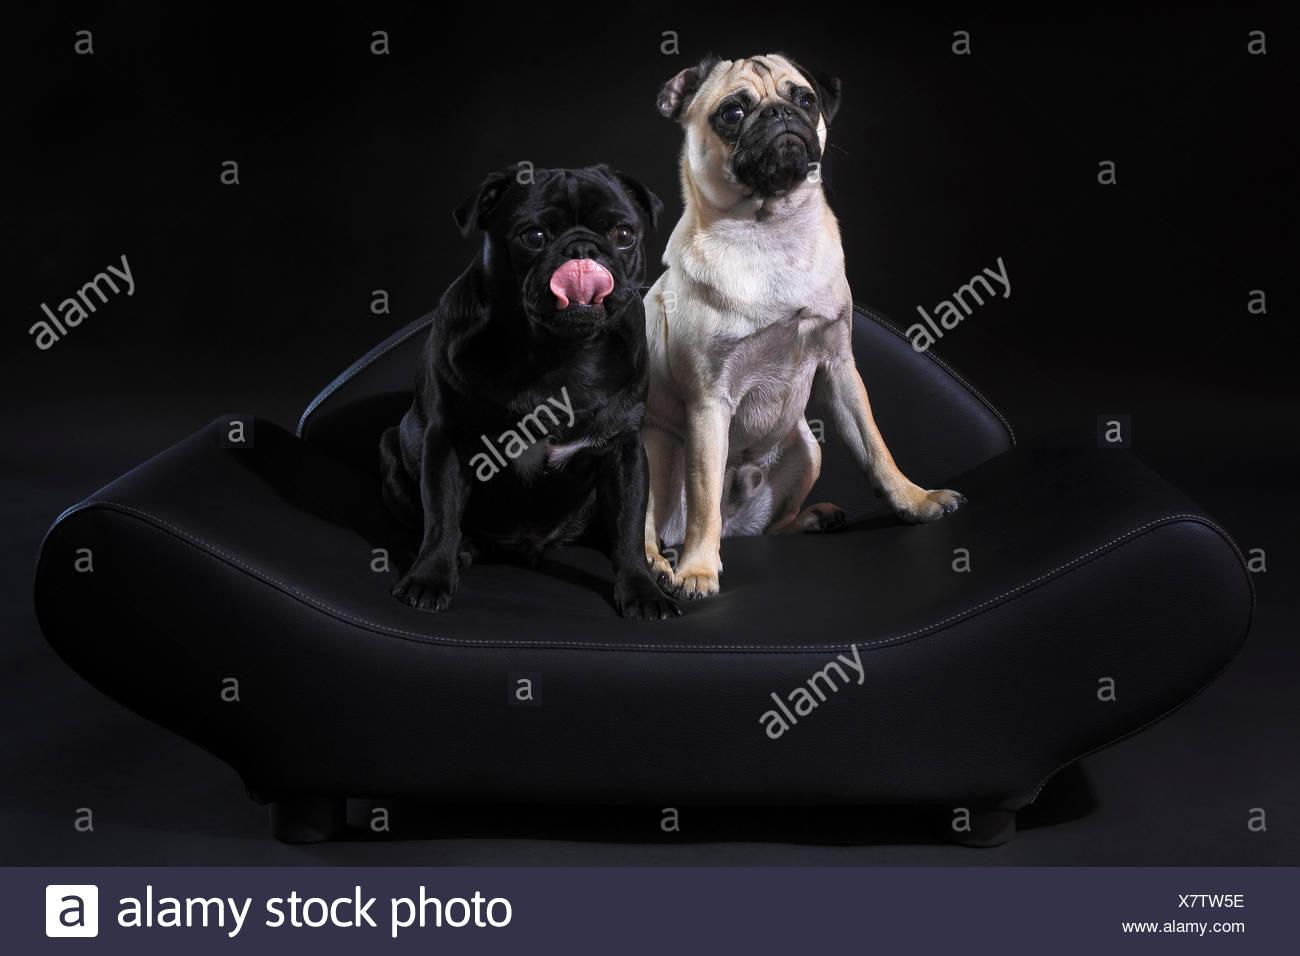 2, domestic animal, pet, dog, dogs, dog sofa, pugs, fatties, mops, pugs, fatties, pair, couple, portrait, couple, sofa, four-leg - Stock Image